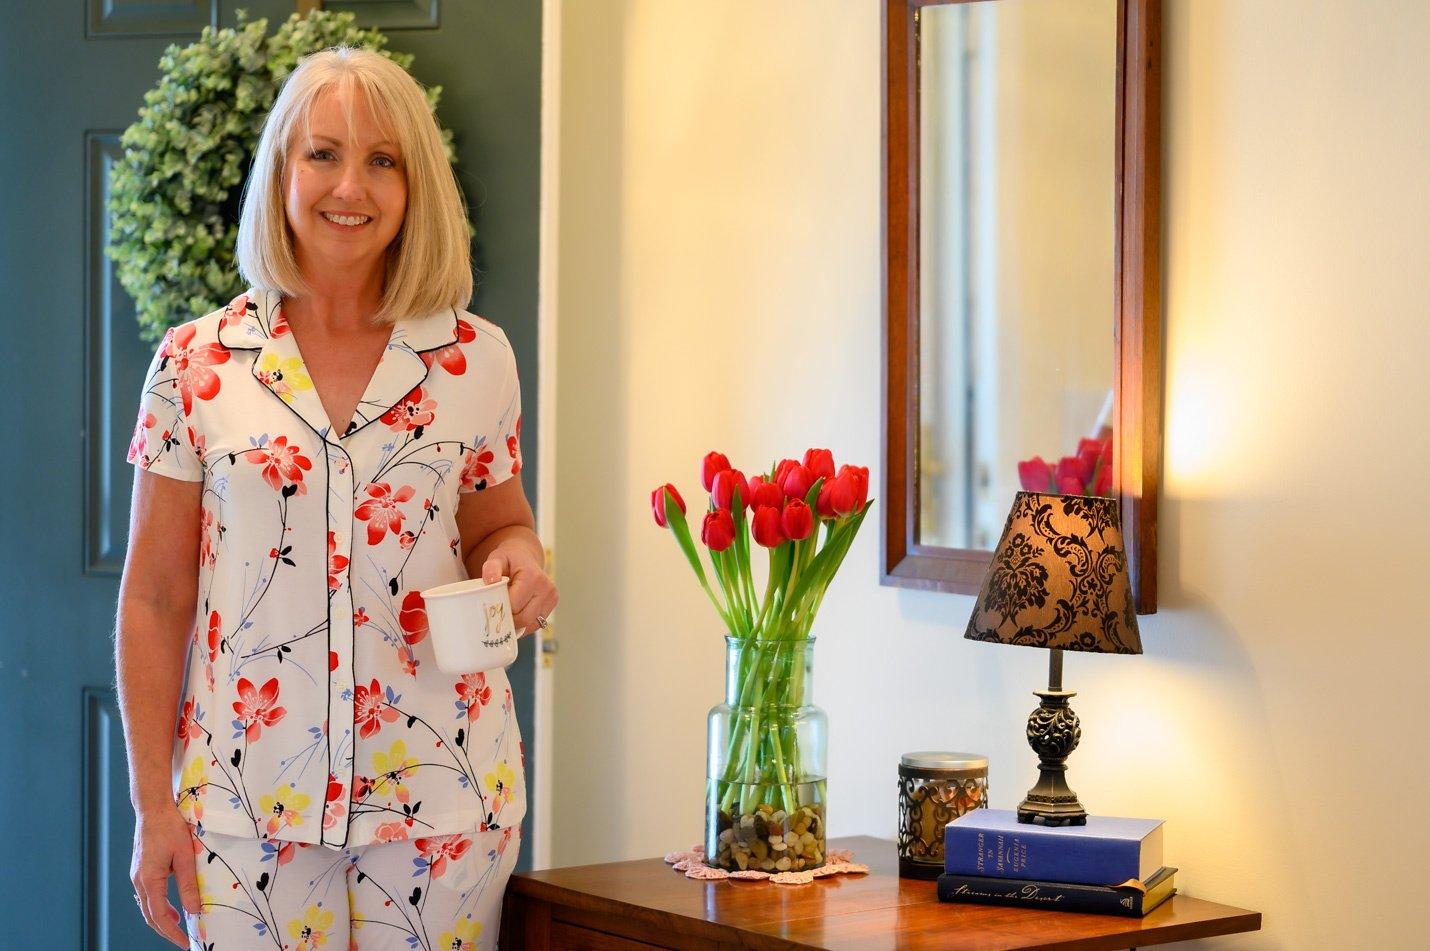 Spring Pajamas to Keep You Cool & Comfy